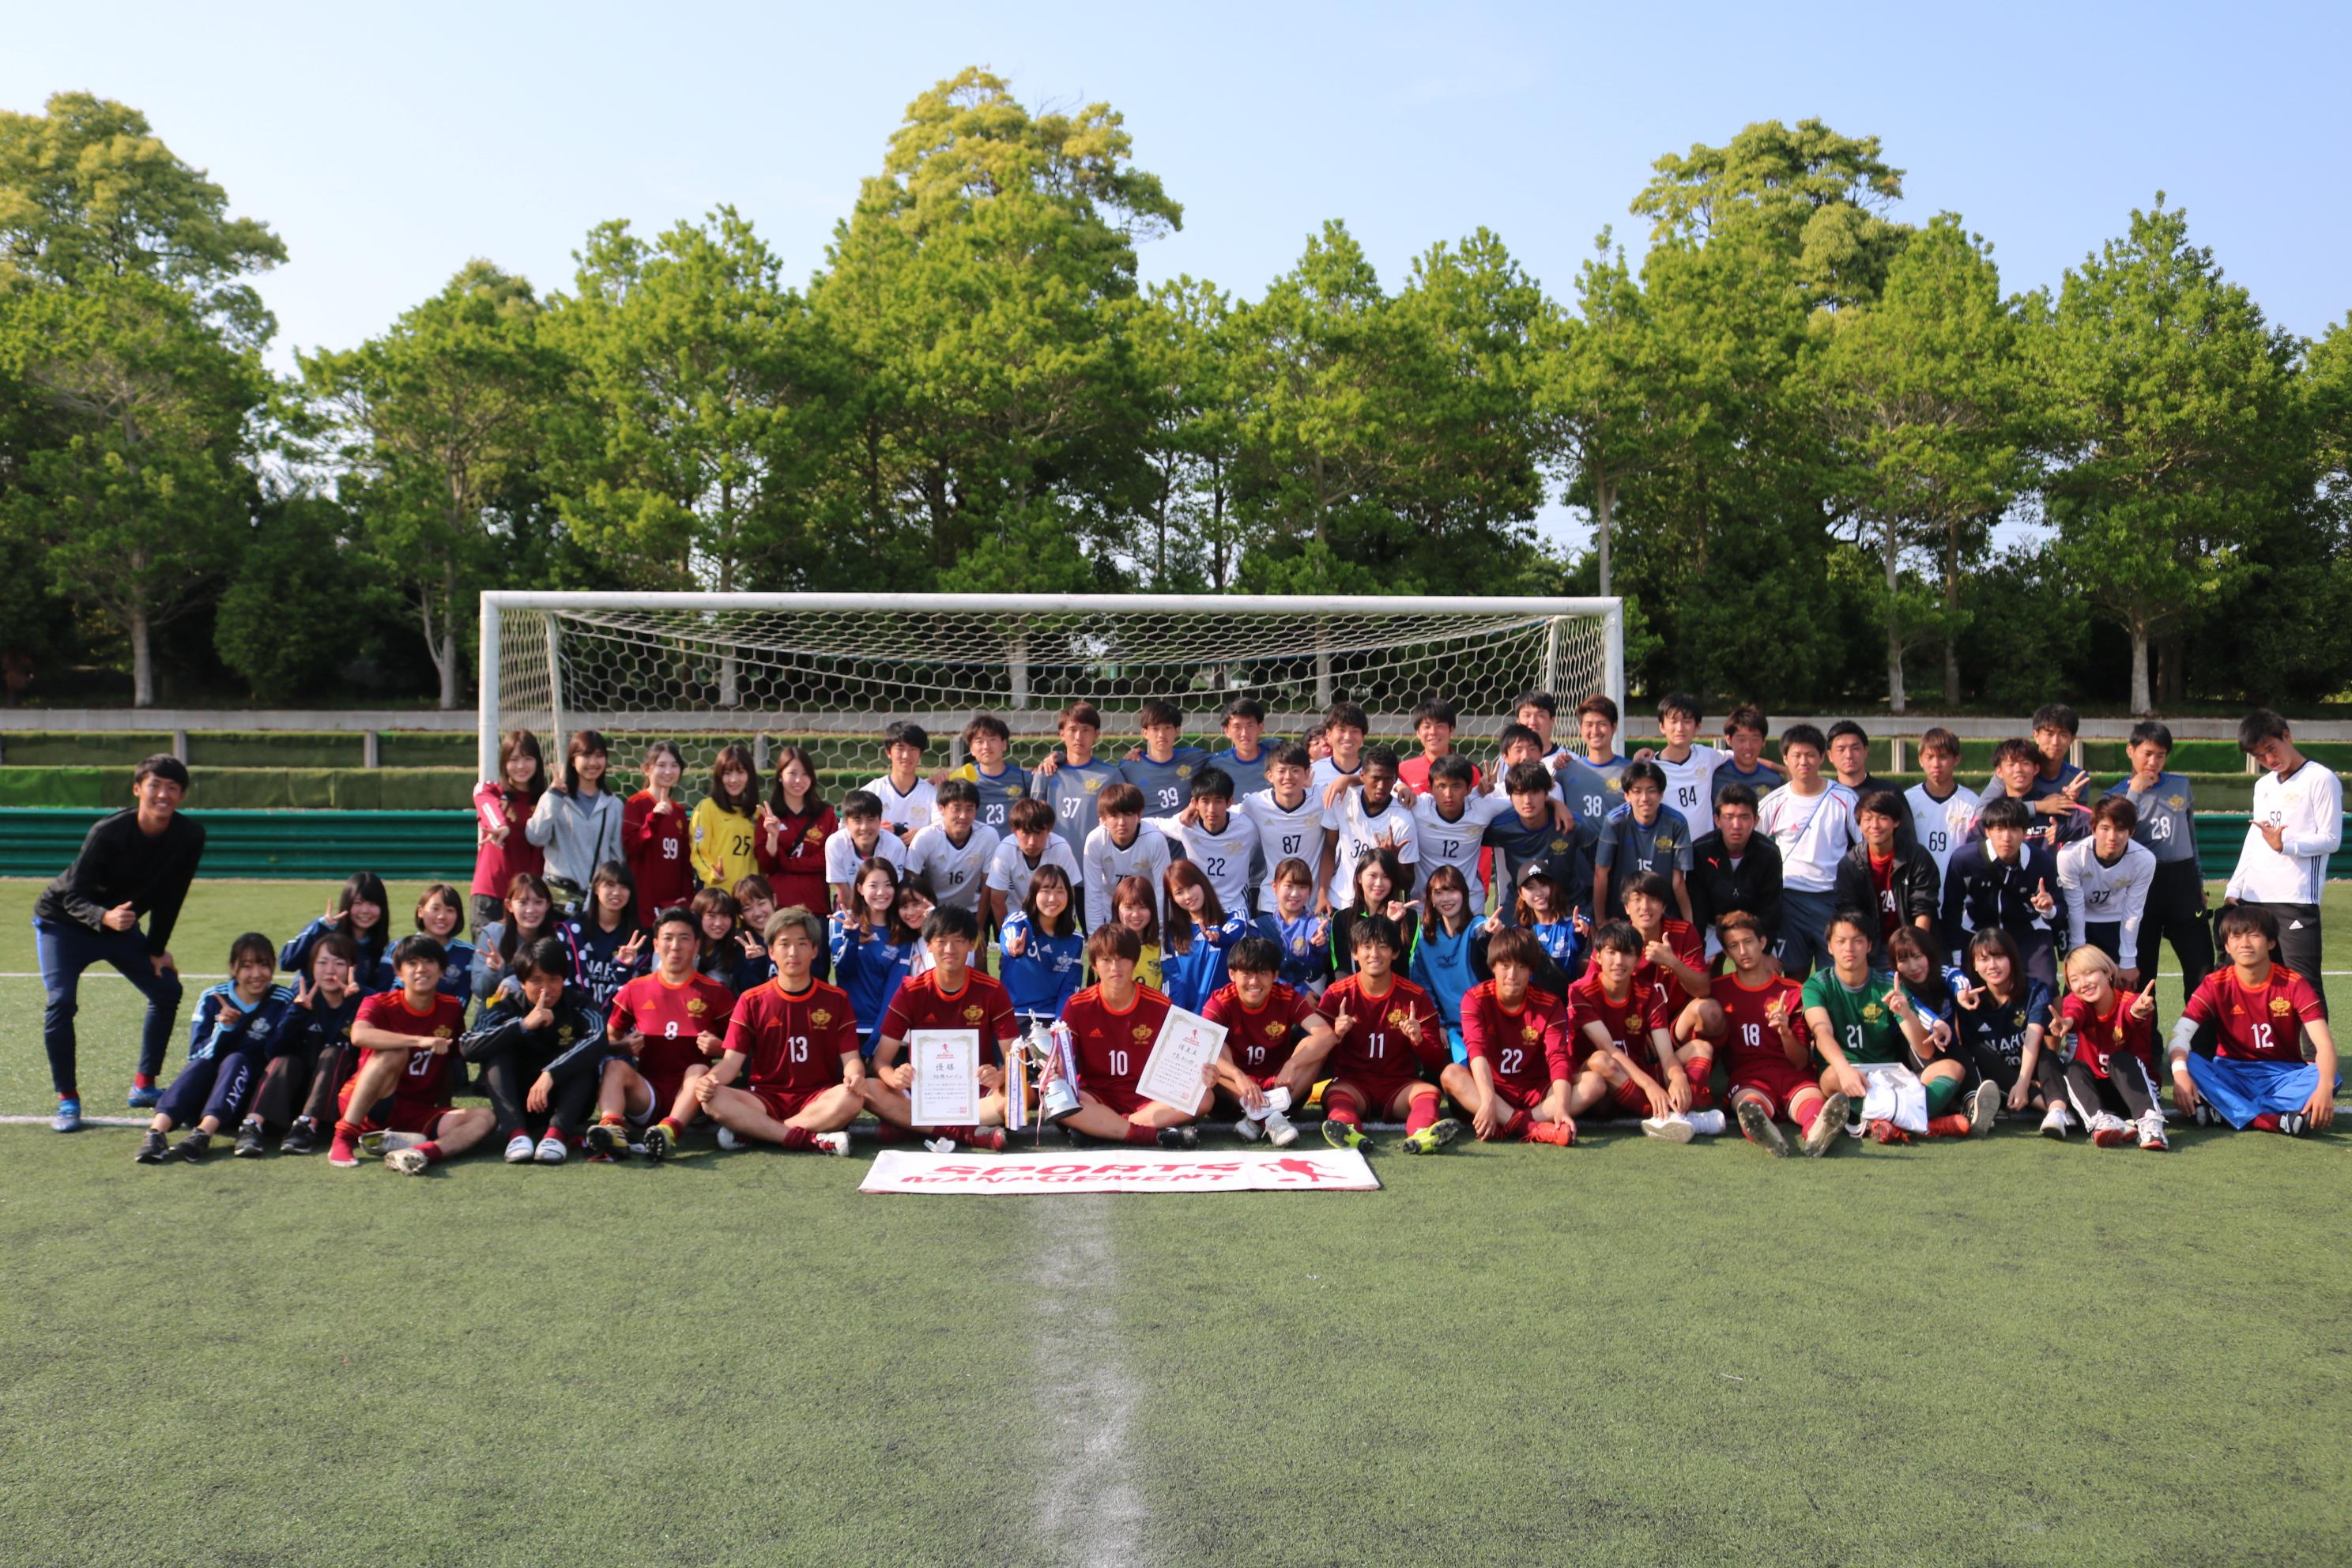 2019/5/11(土)~5/12(日) 稲穂FESTA ~第17回 サッカー同好会 強化交流戦~